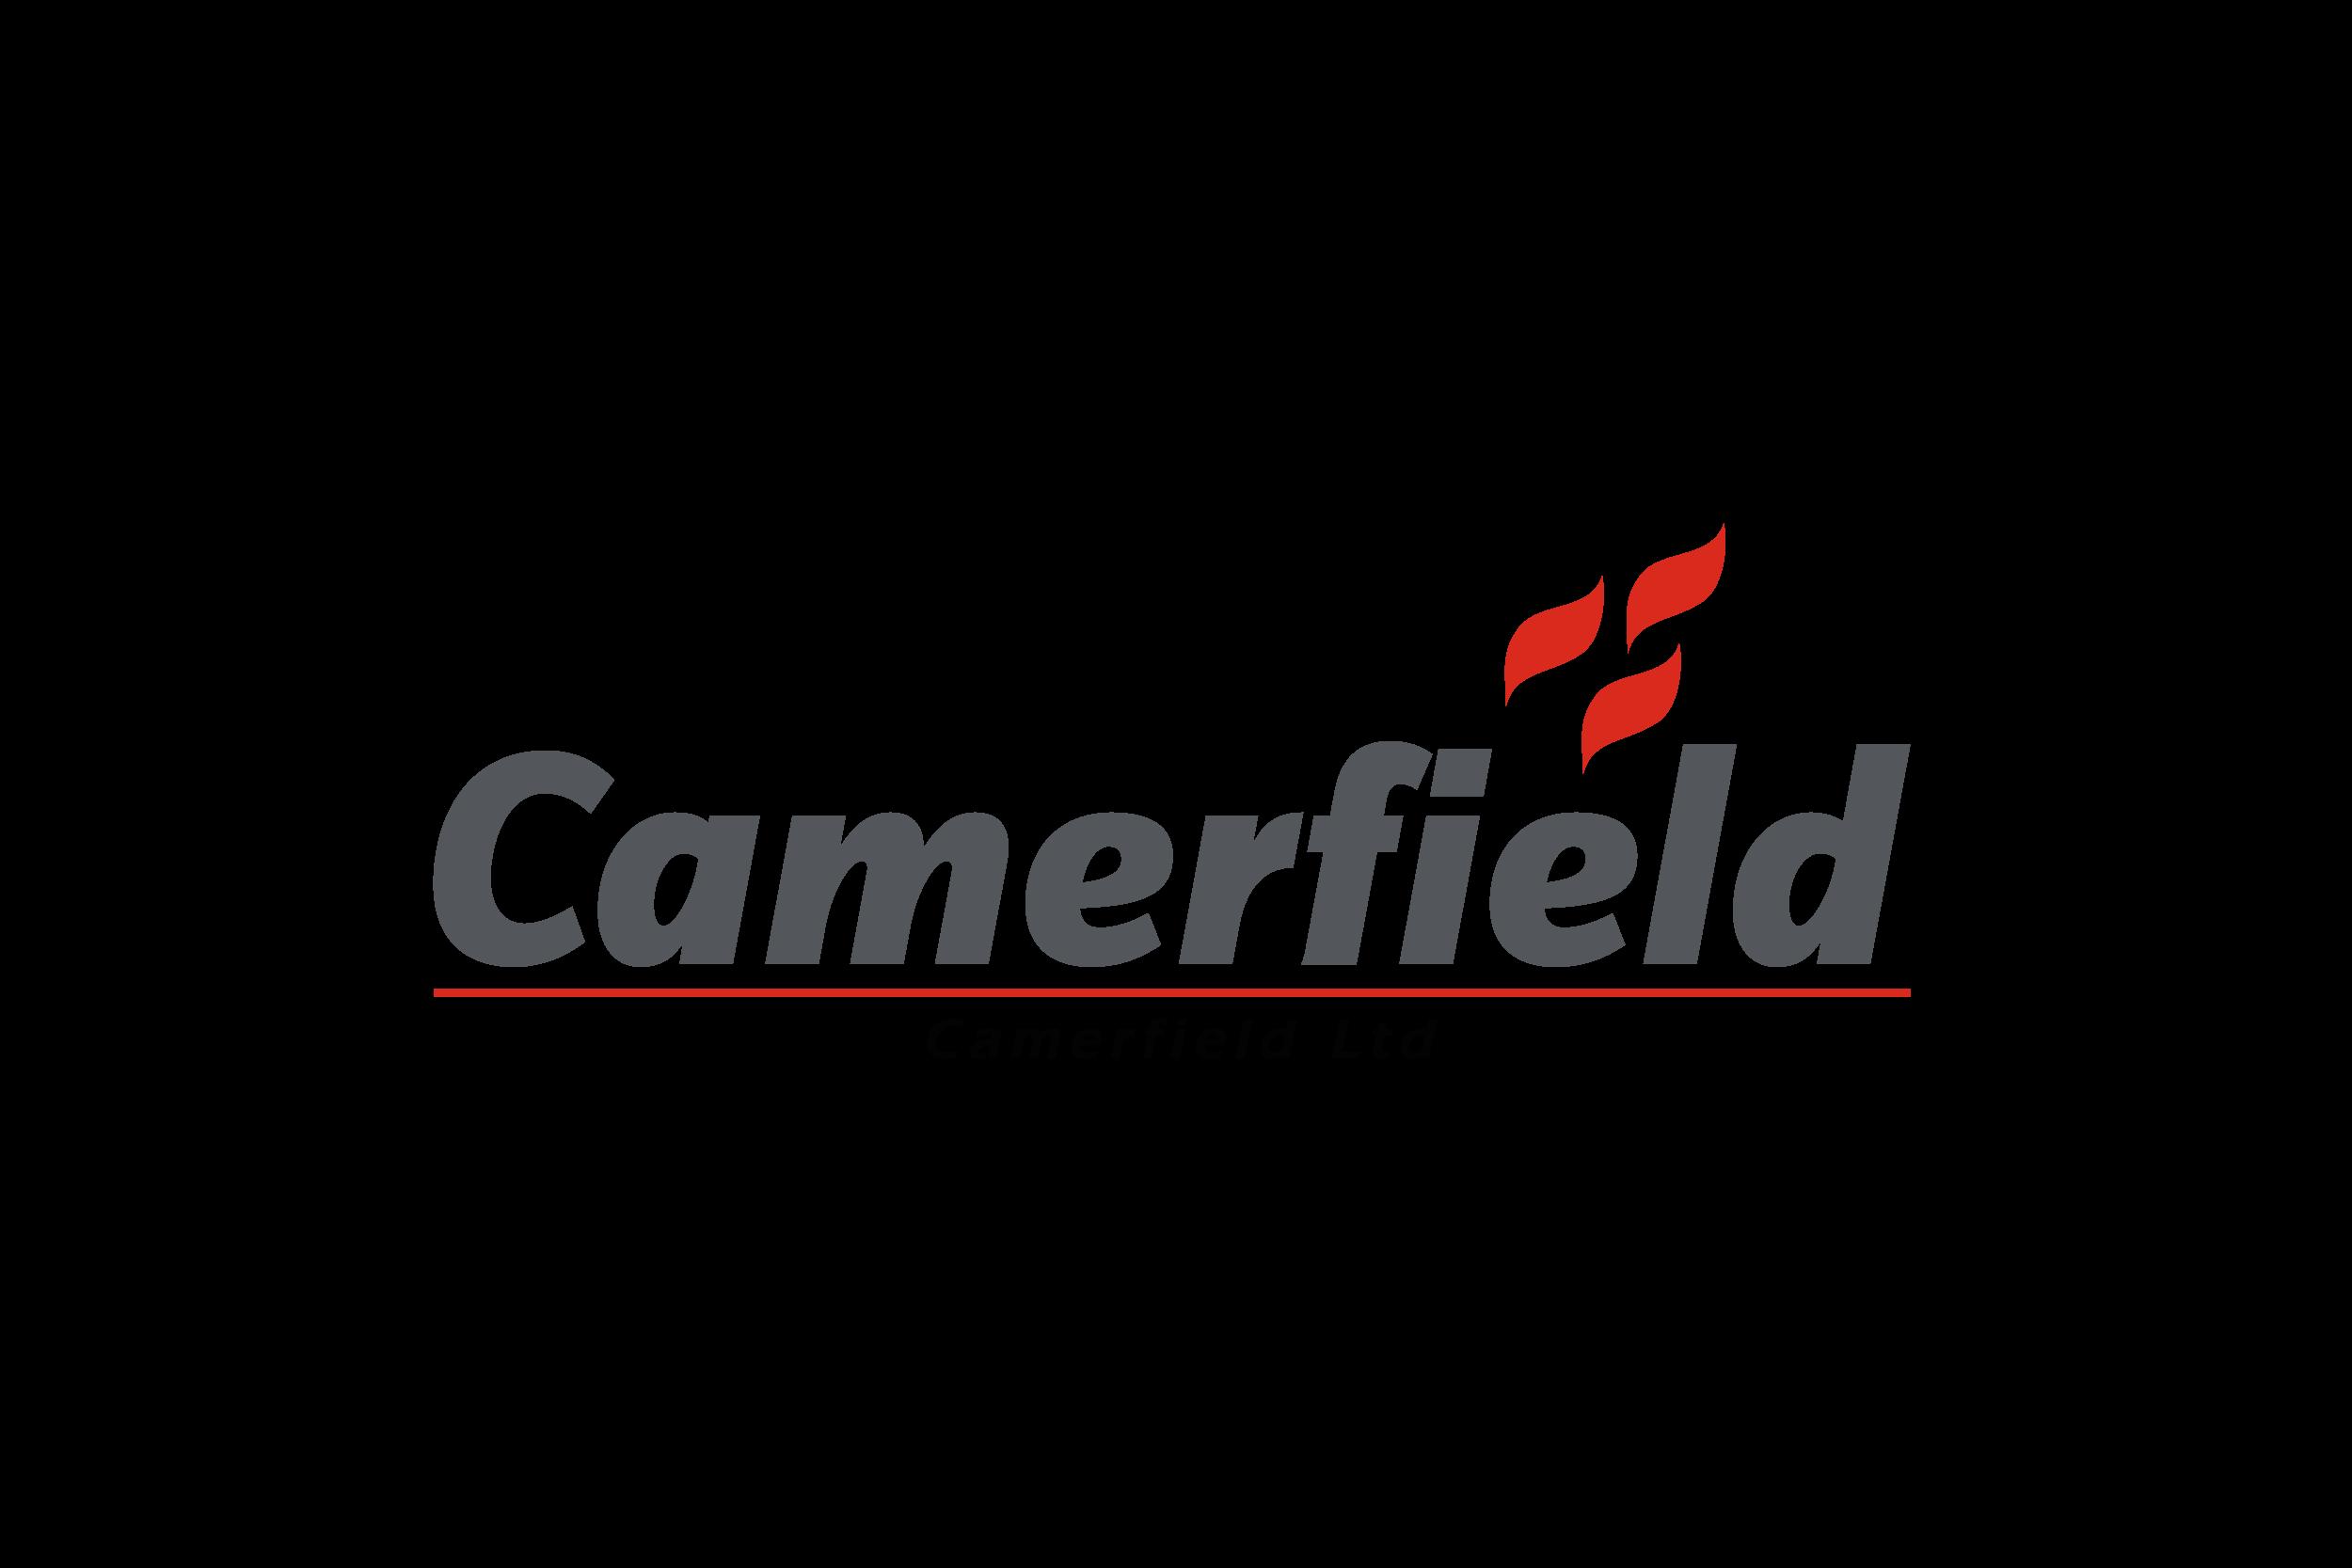 Camerfield logo